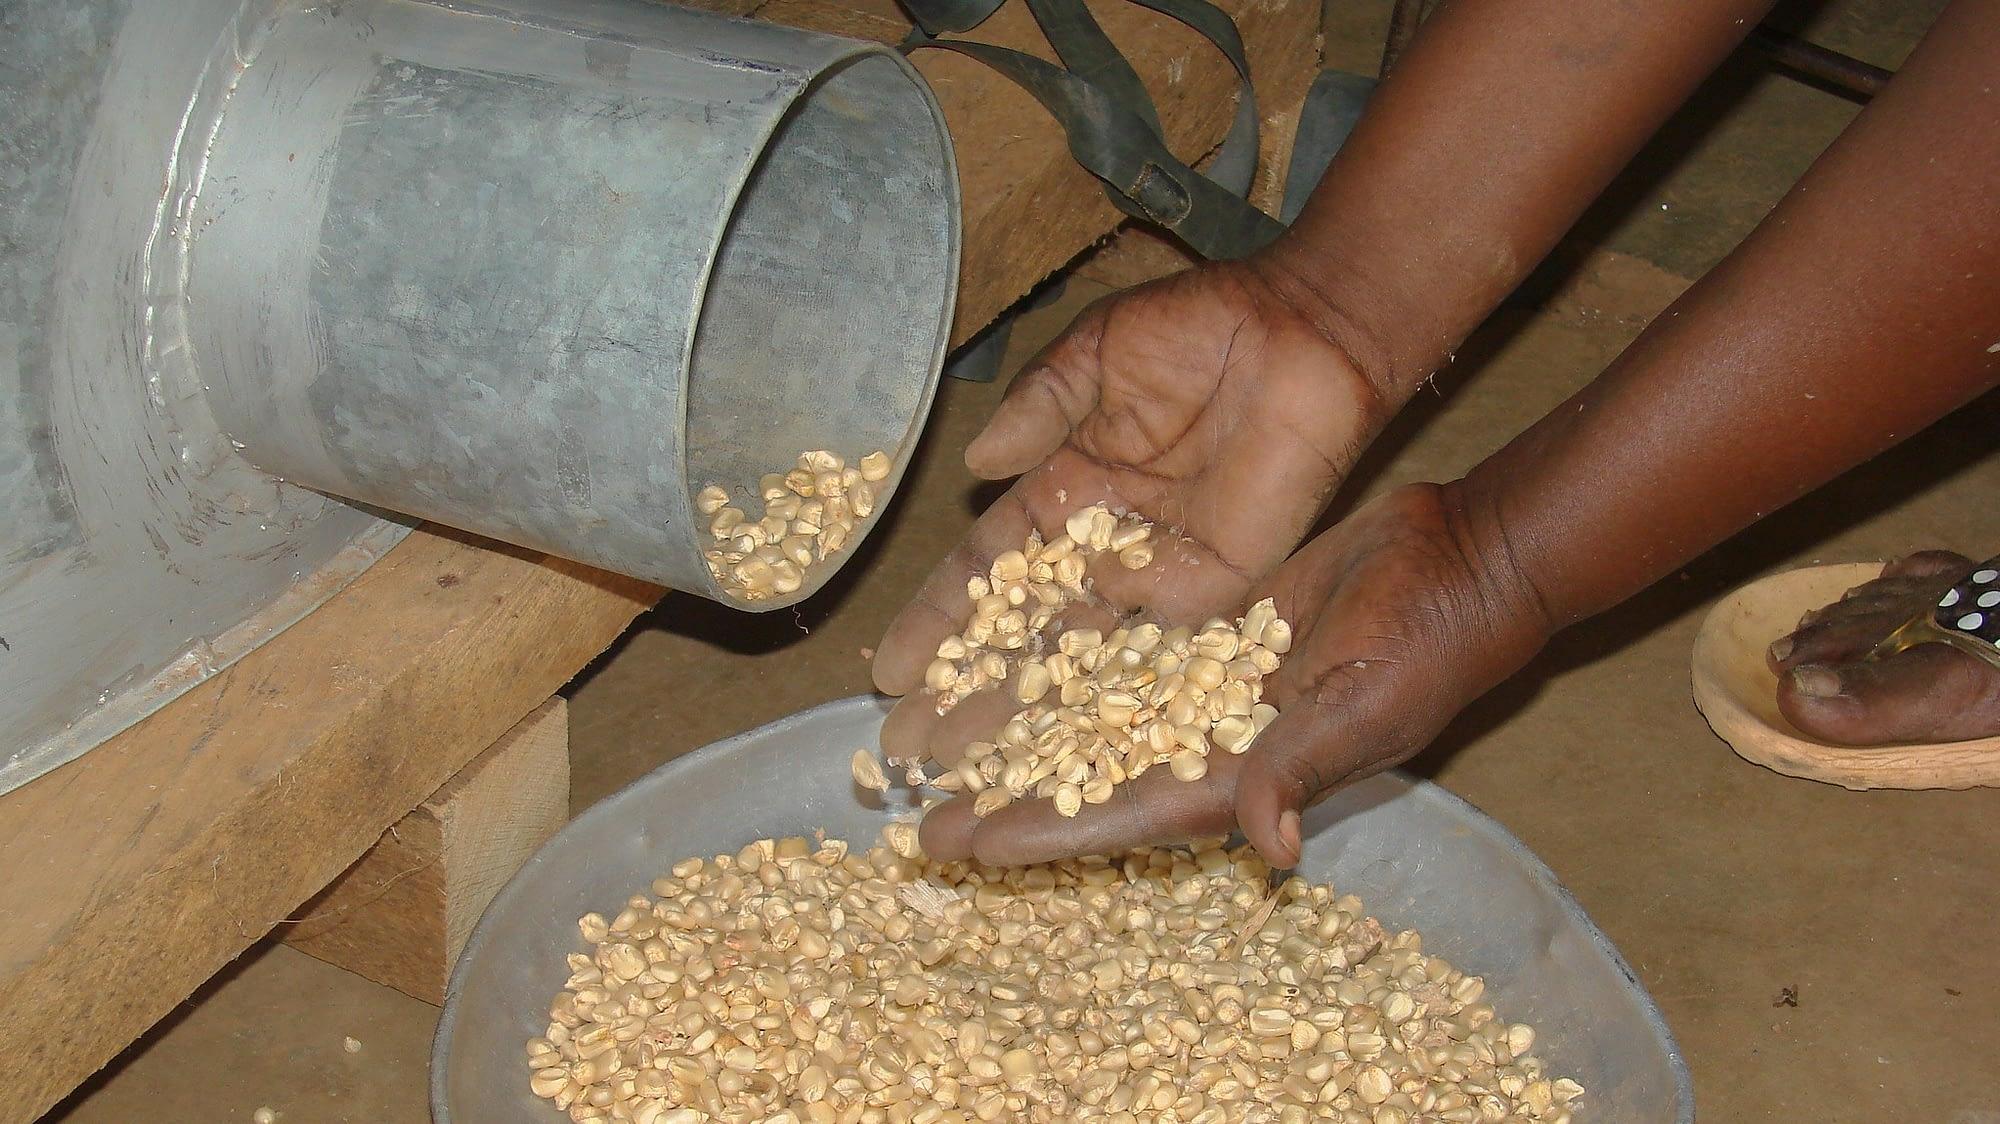 A farmer empties a metal silo filled with maize grain in Embu, Kenya. (Photo: CIMMYT)